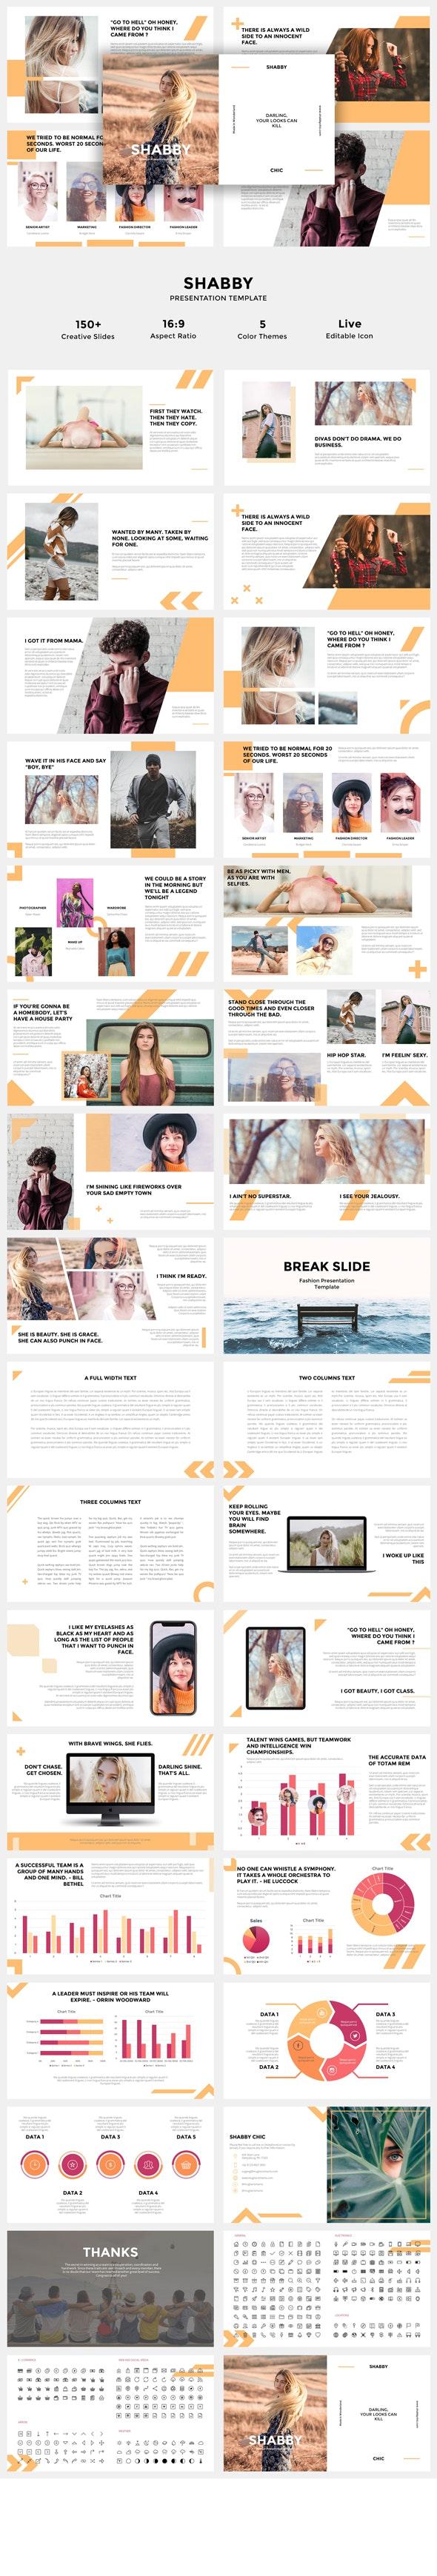 Shabby - Powerpoint Presentation Templates - Creative PowerPoint Templates